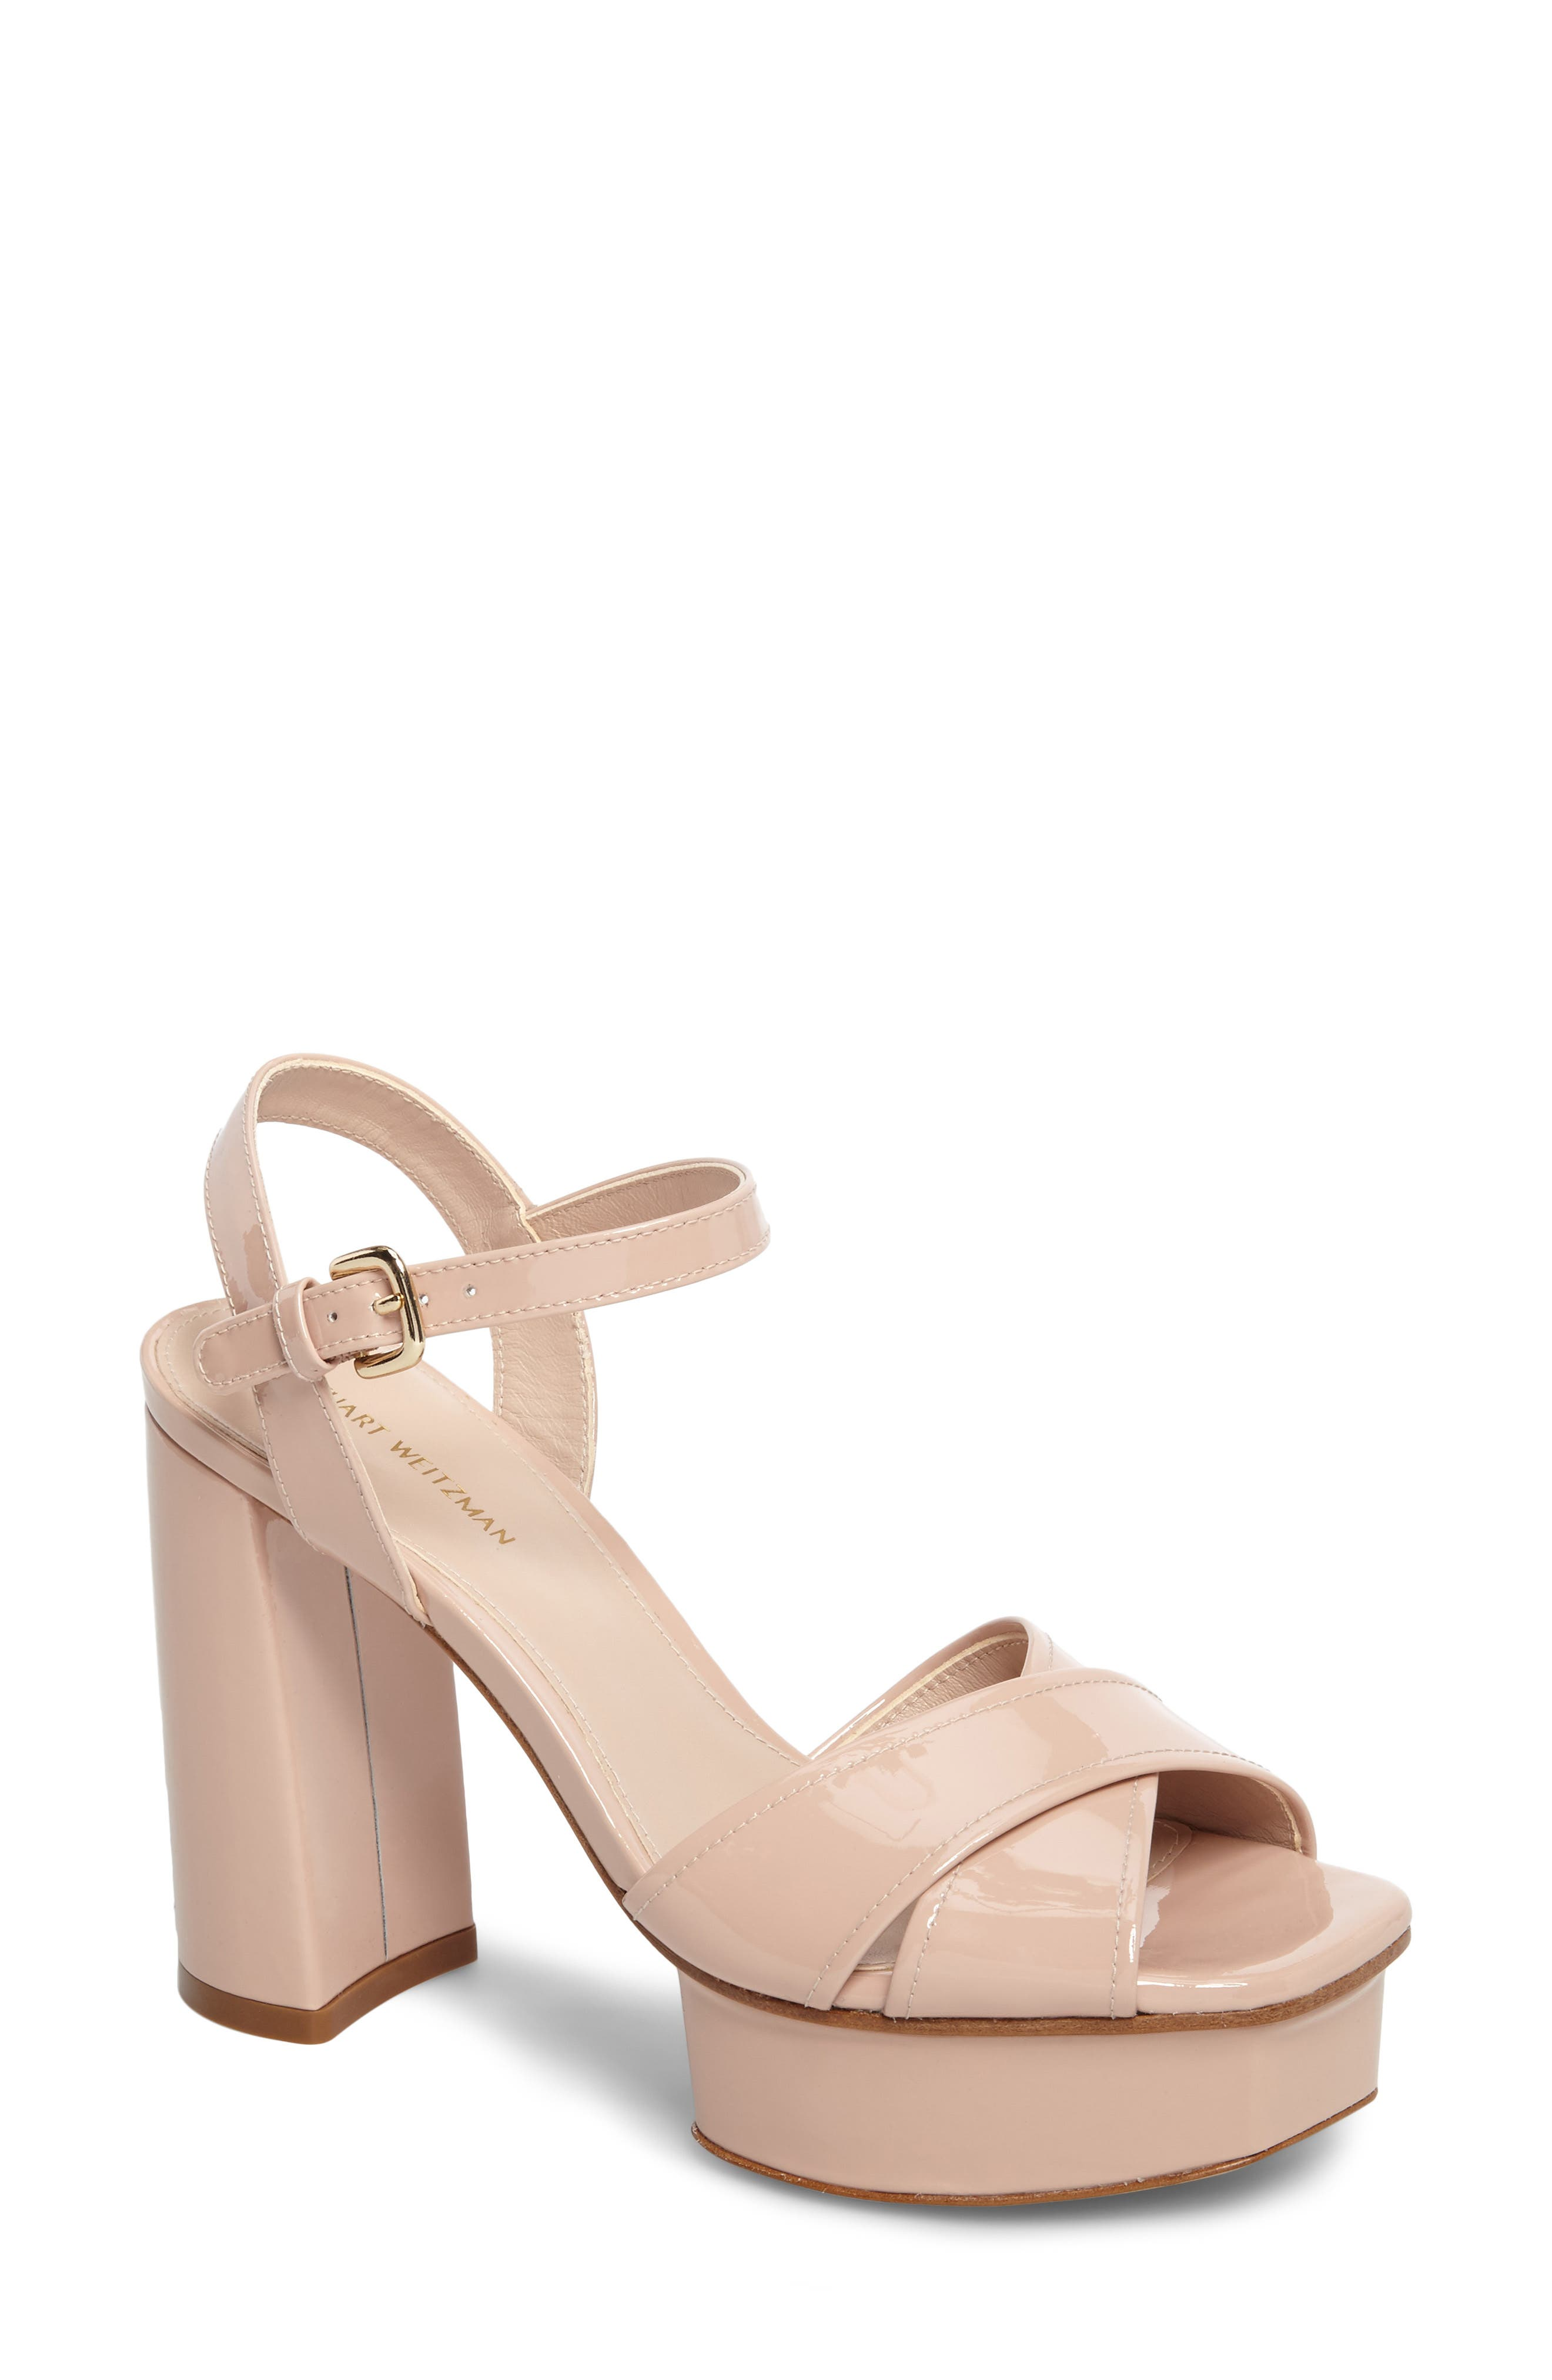 Exposed Platform Sandal,                             Main thumbnail 1, color,                             Face Aniline